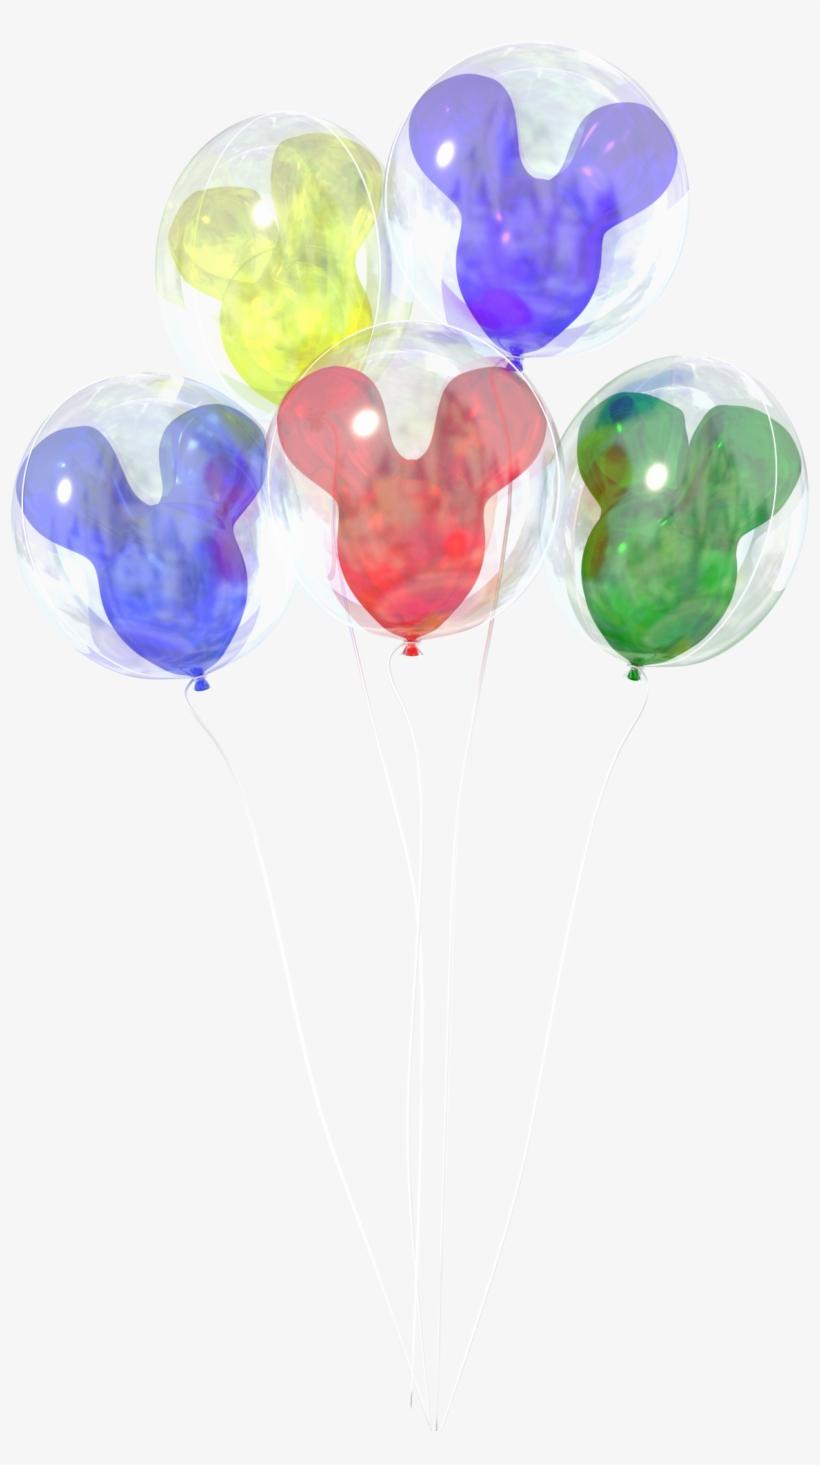 Fan Madewalt - Disney World Balloon Png, transparent png #17806